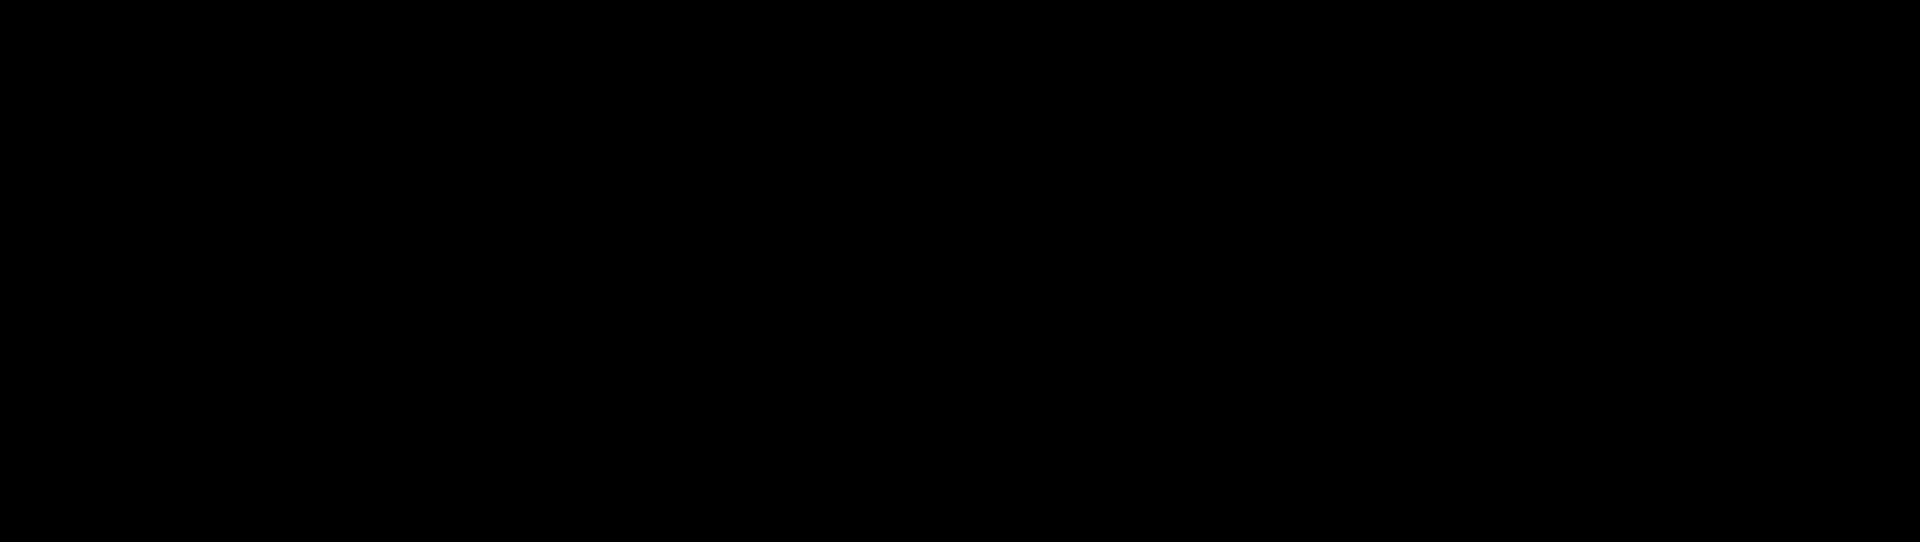 Wilhelm Röntgen signature